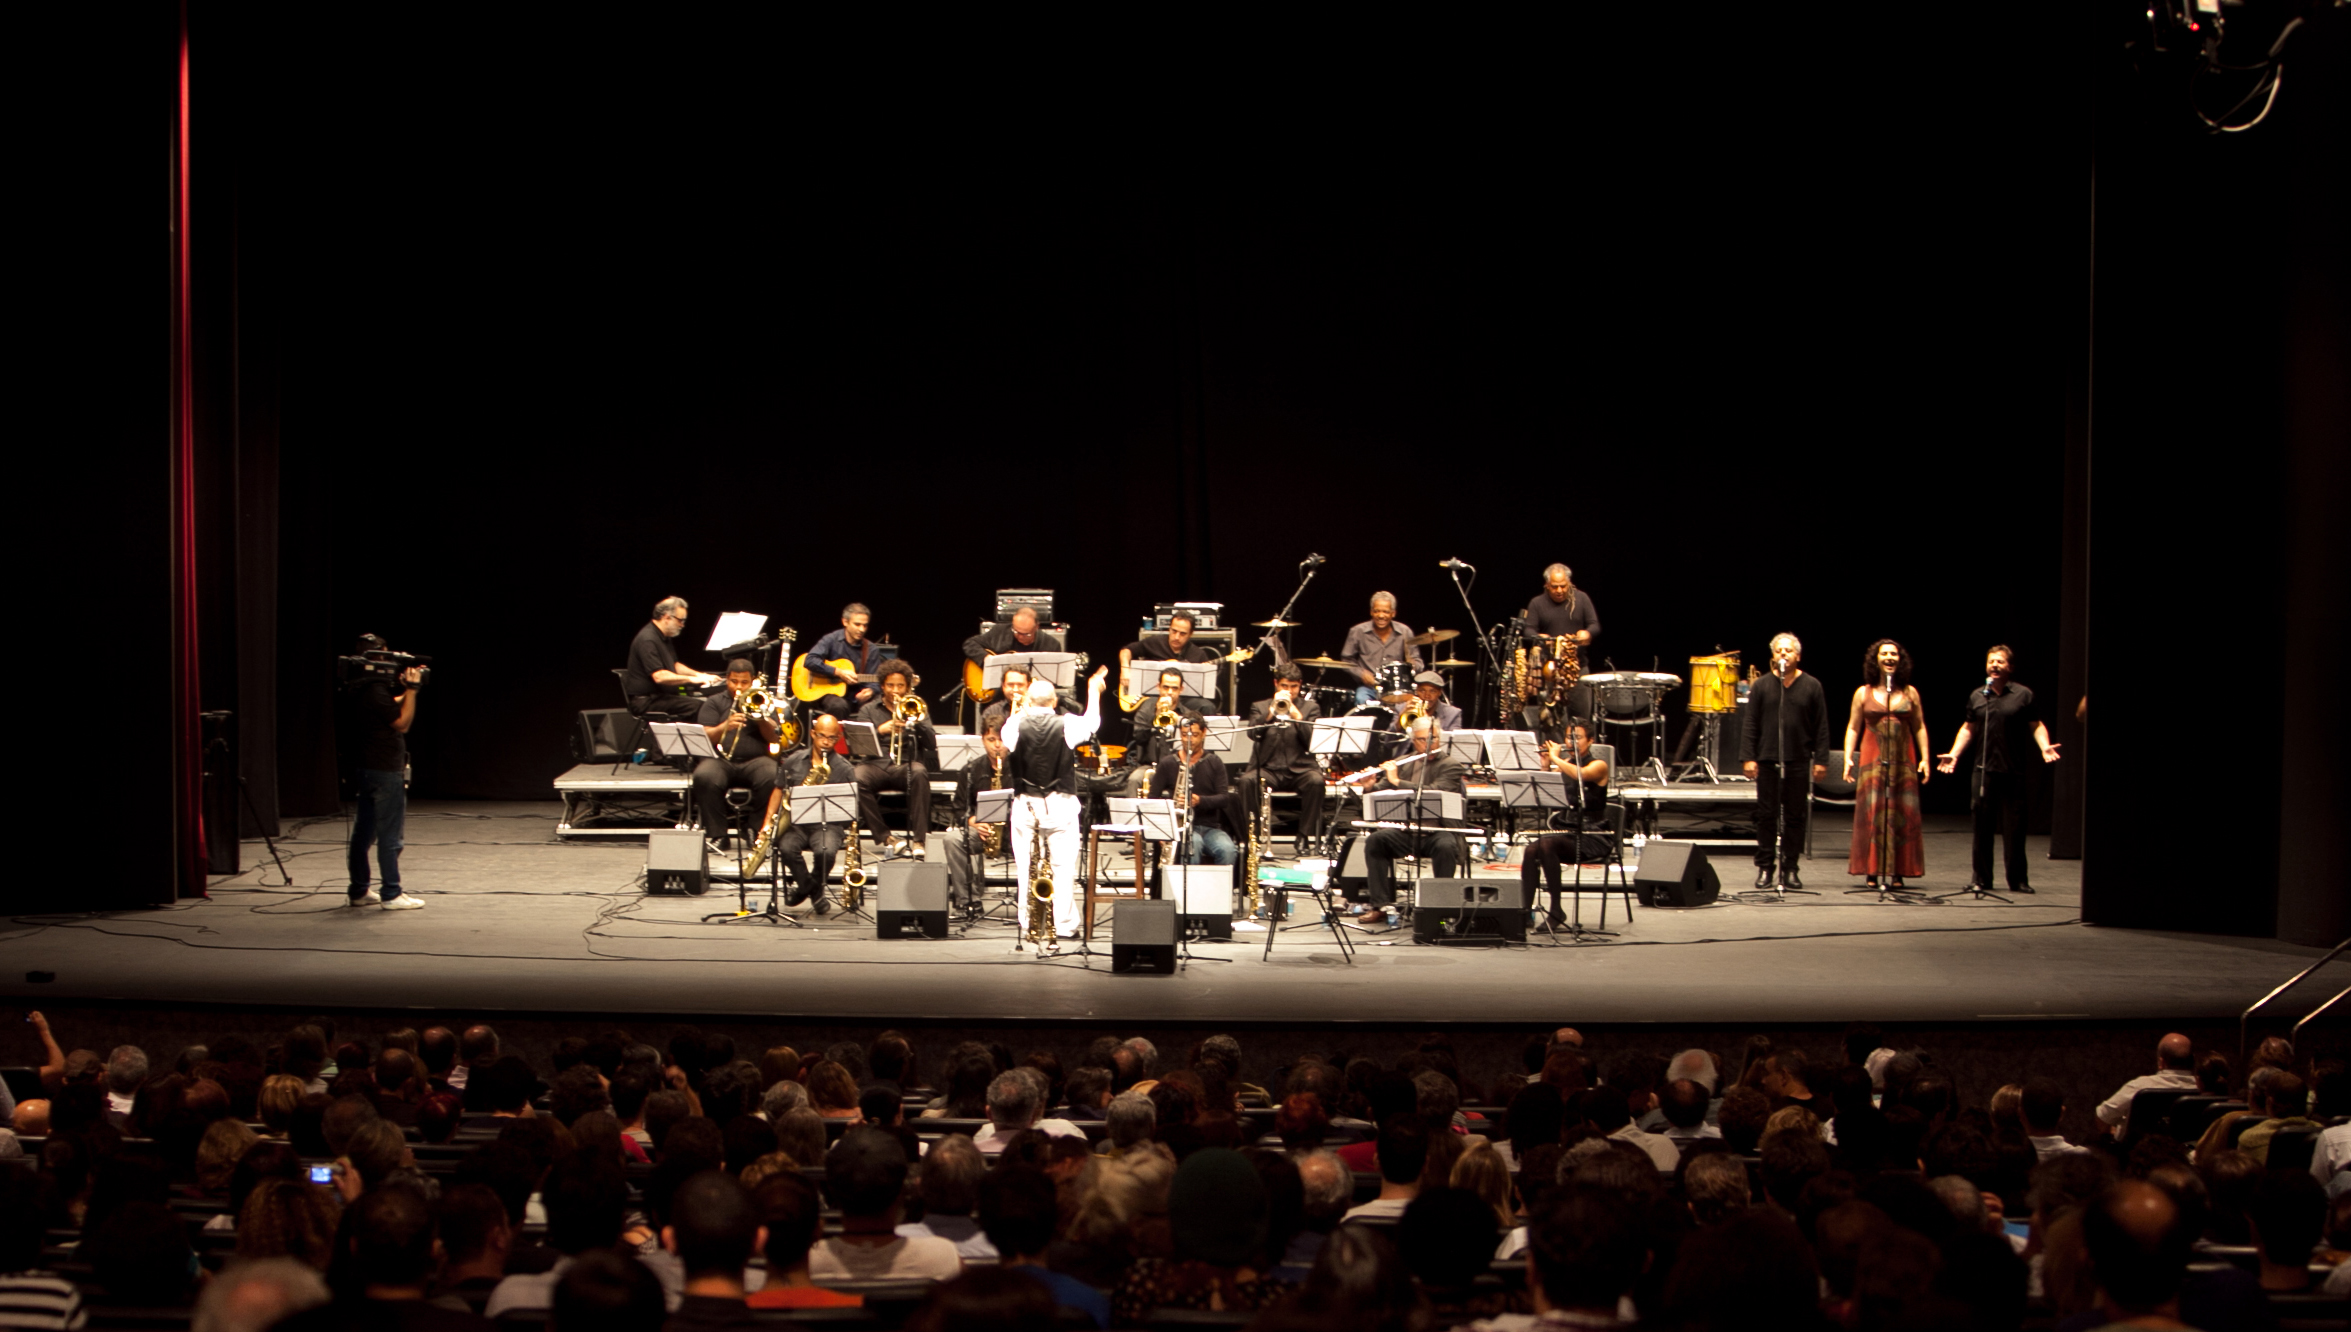 Nivaldo & Jazz Mineiro Orquestra